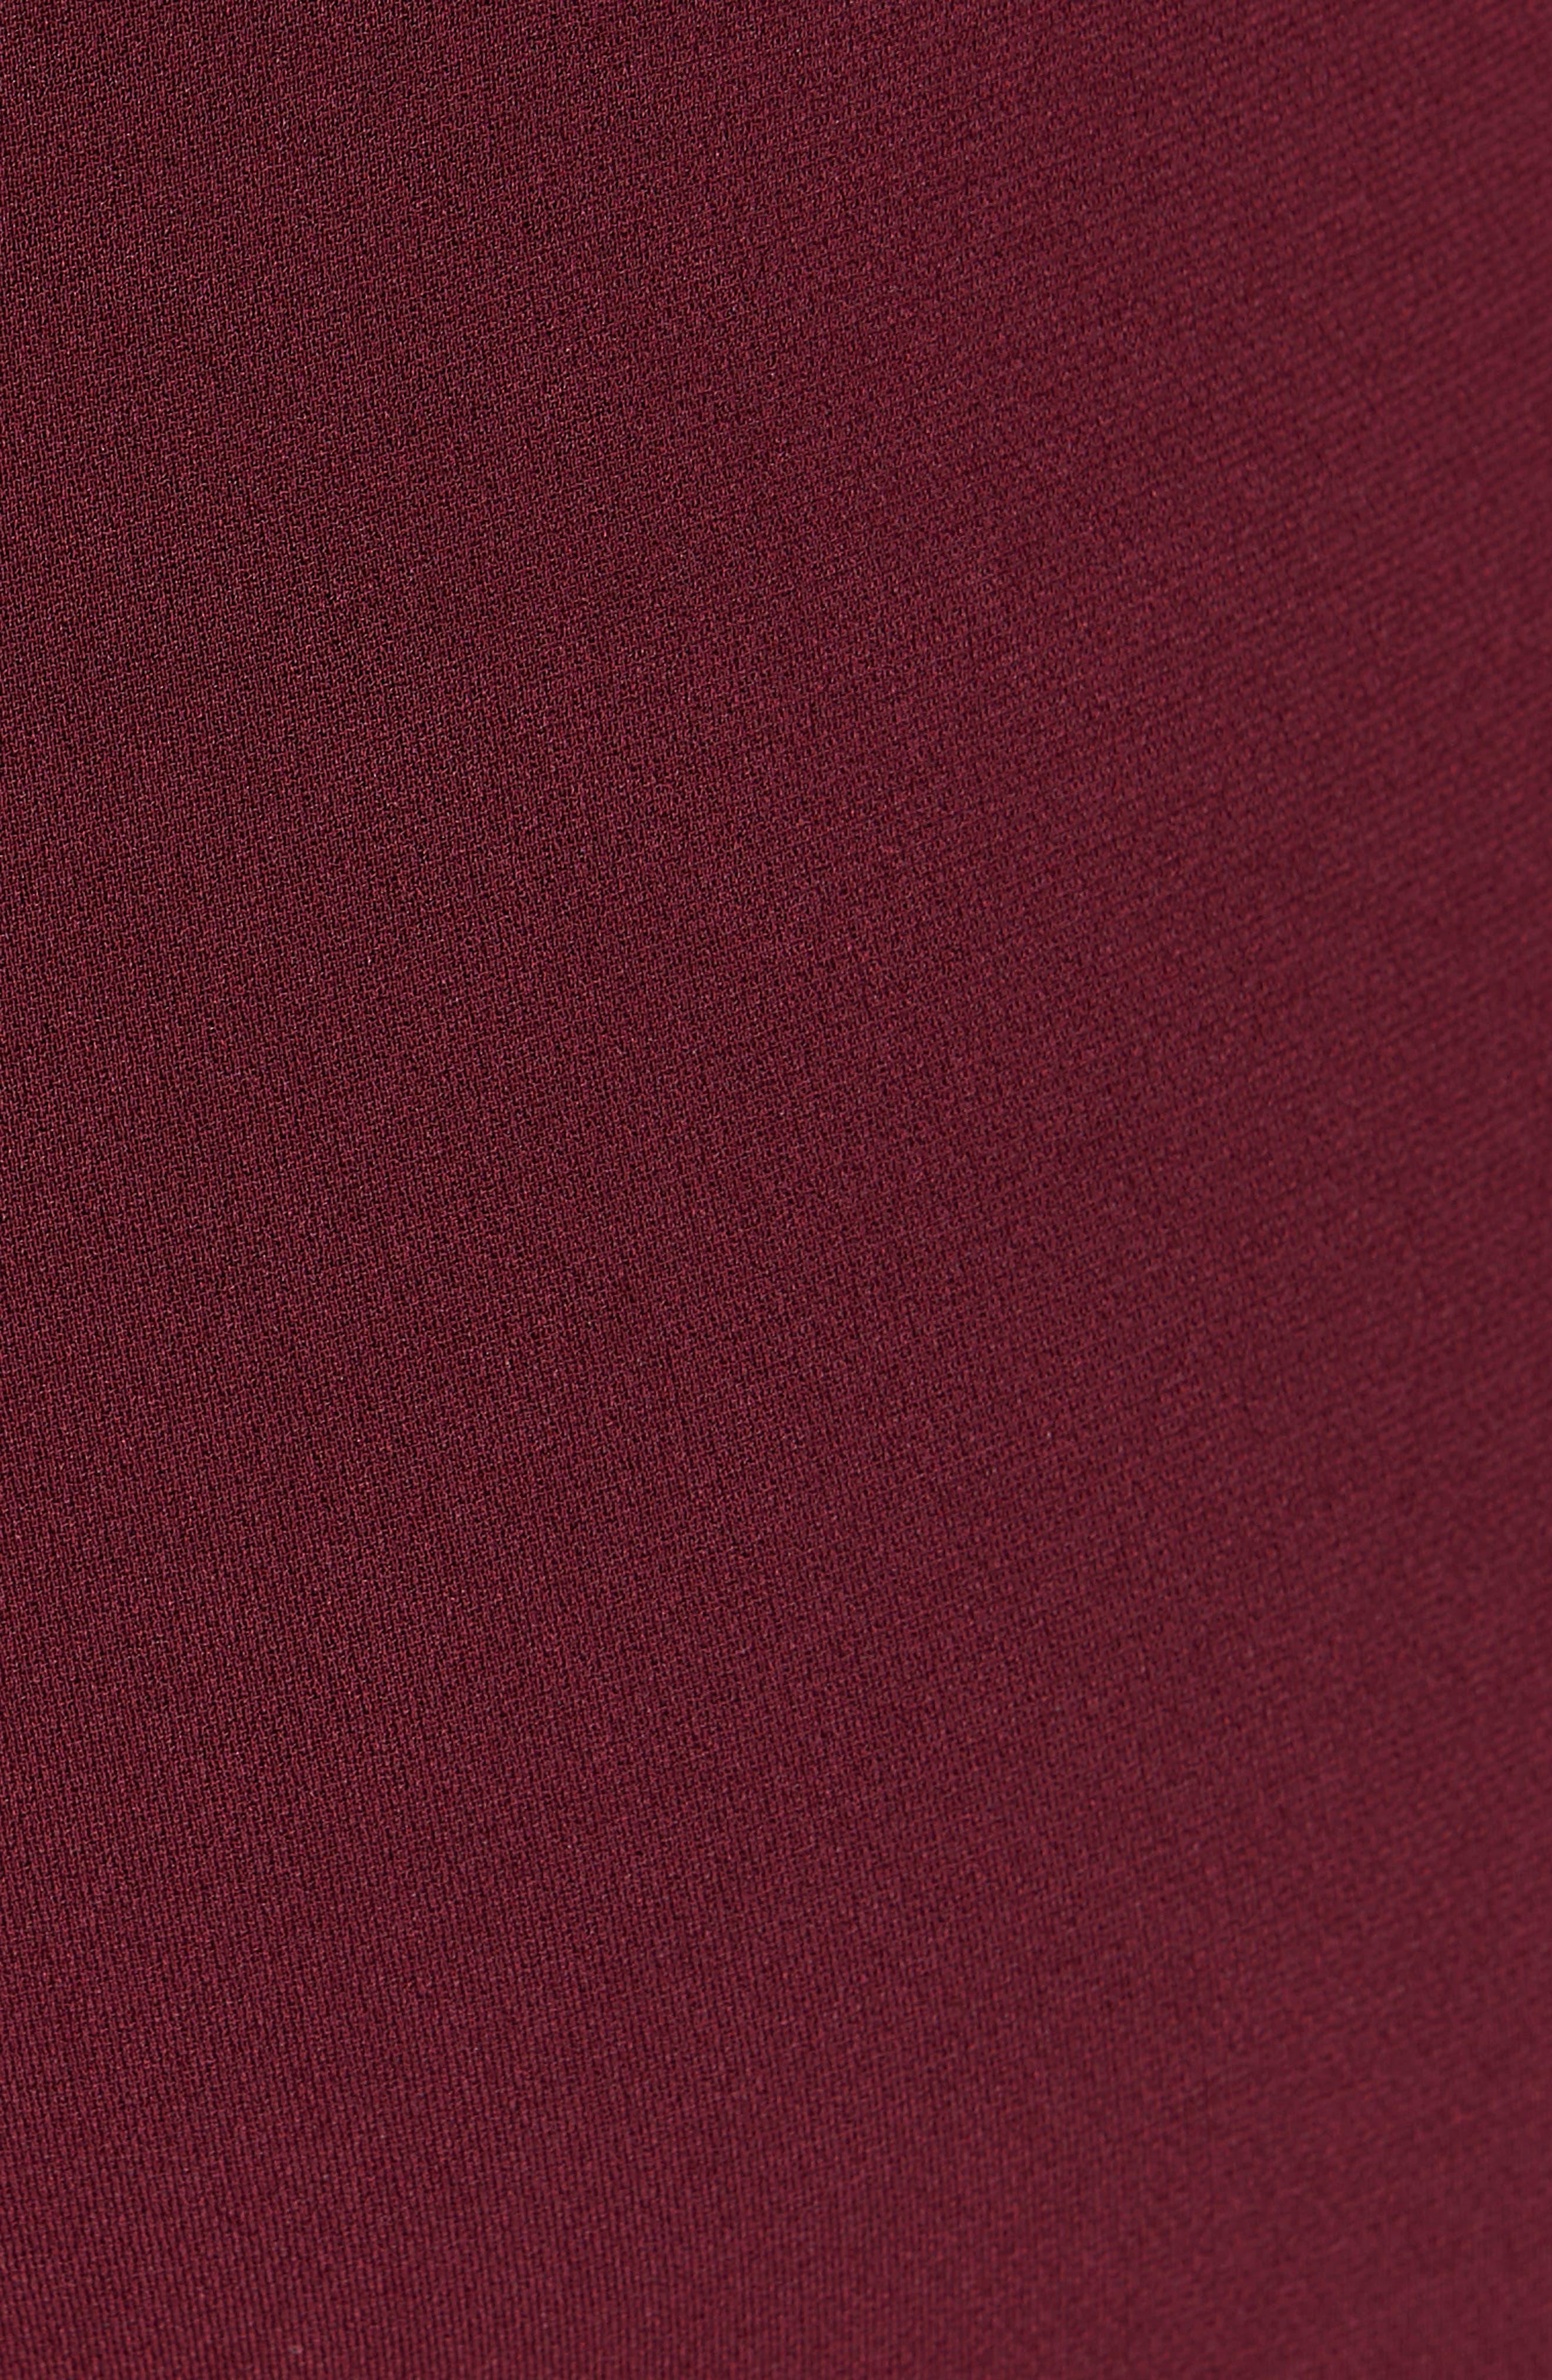 Treeca Crepe Ankle Pants,                             Alternate thumbnail 5, color,                             930